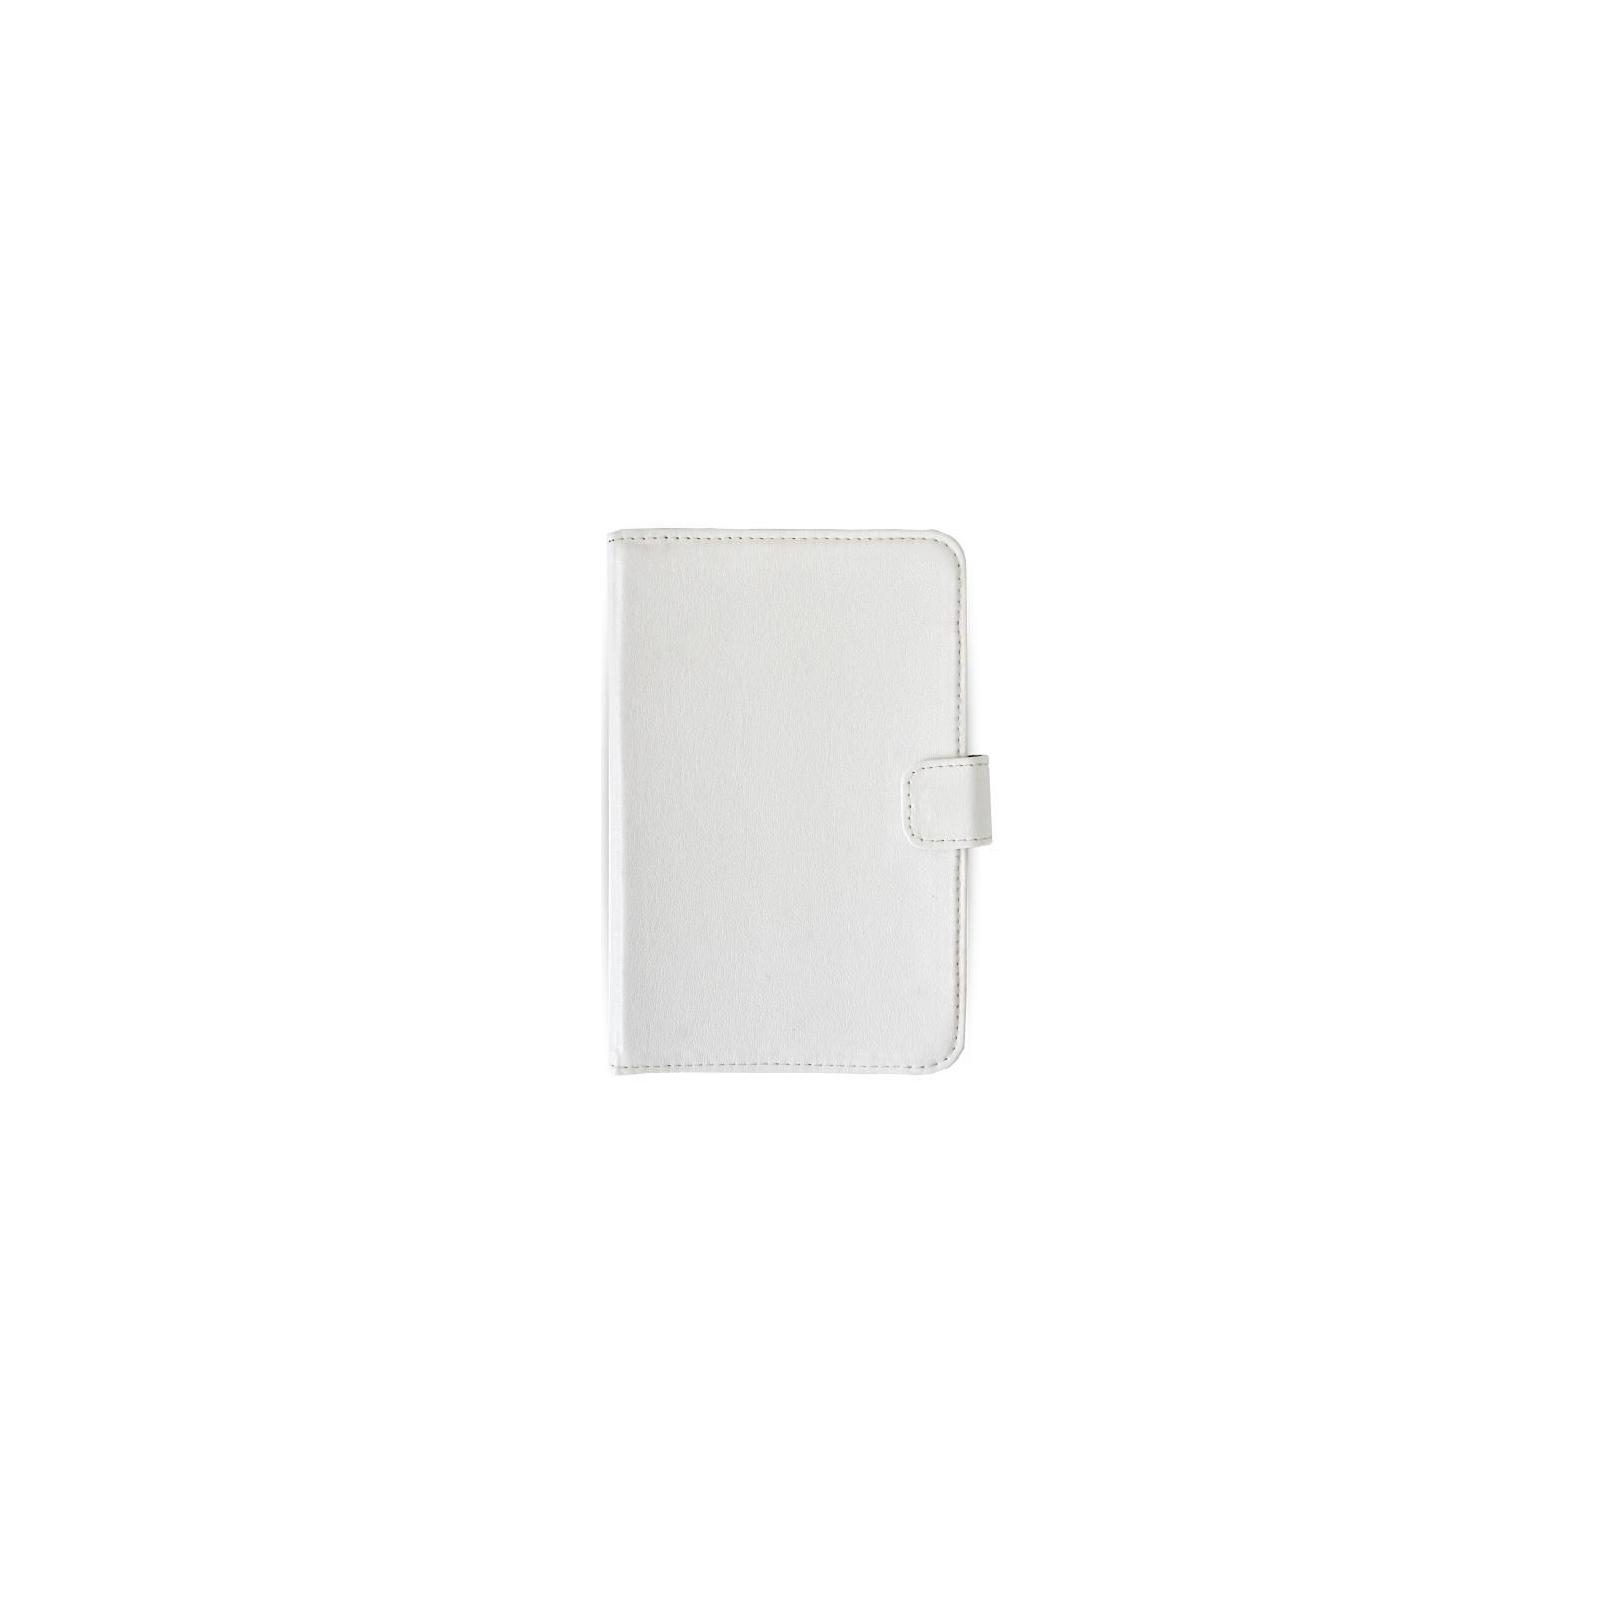 Чехол для планшета Vento 9.7 Advanced - white